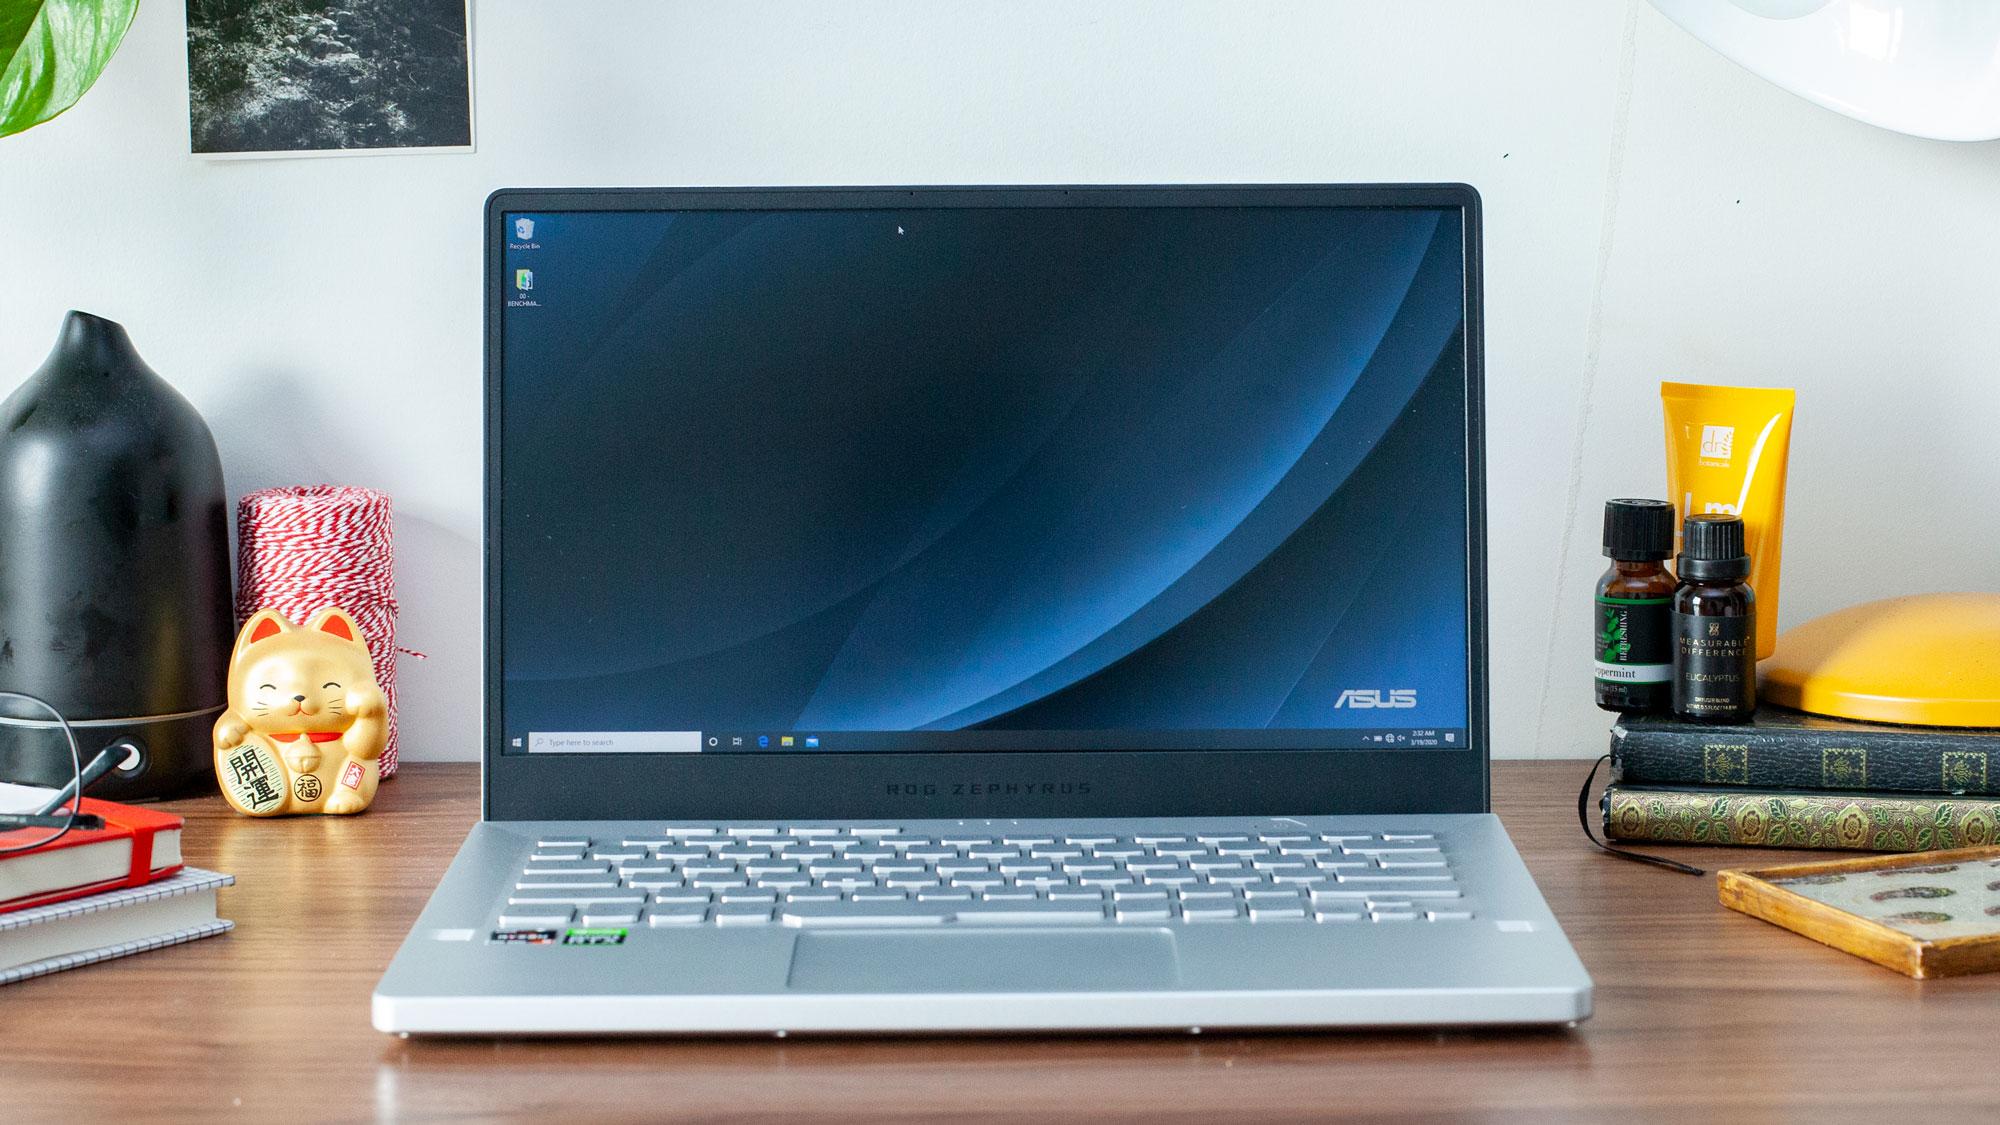 Asus Rog Zephyrus G14 Review Amd Ryzen 9 4900hs Tested Tom S Hardware